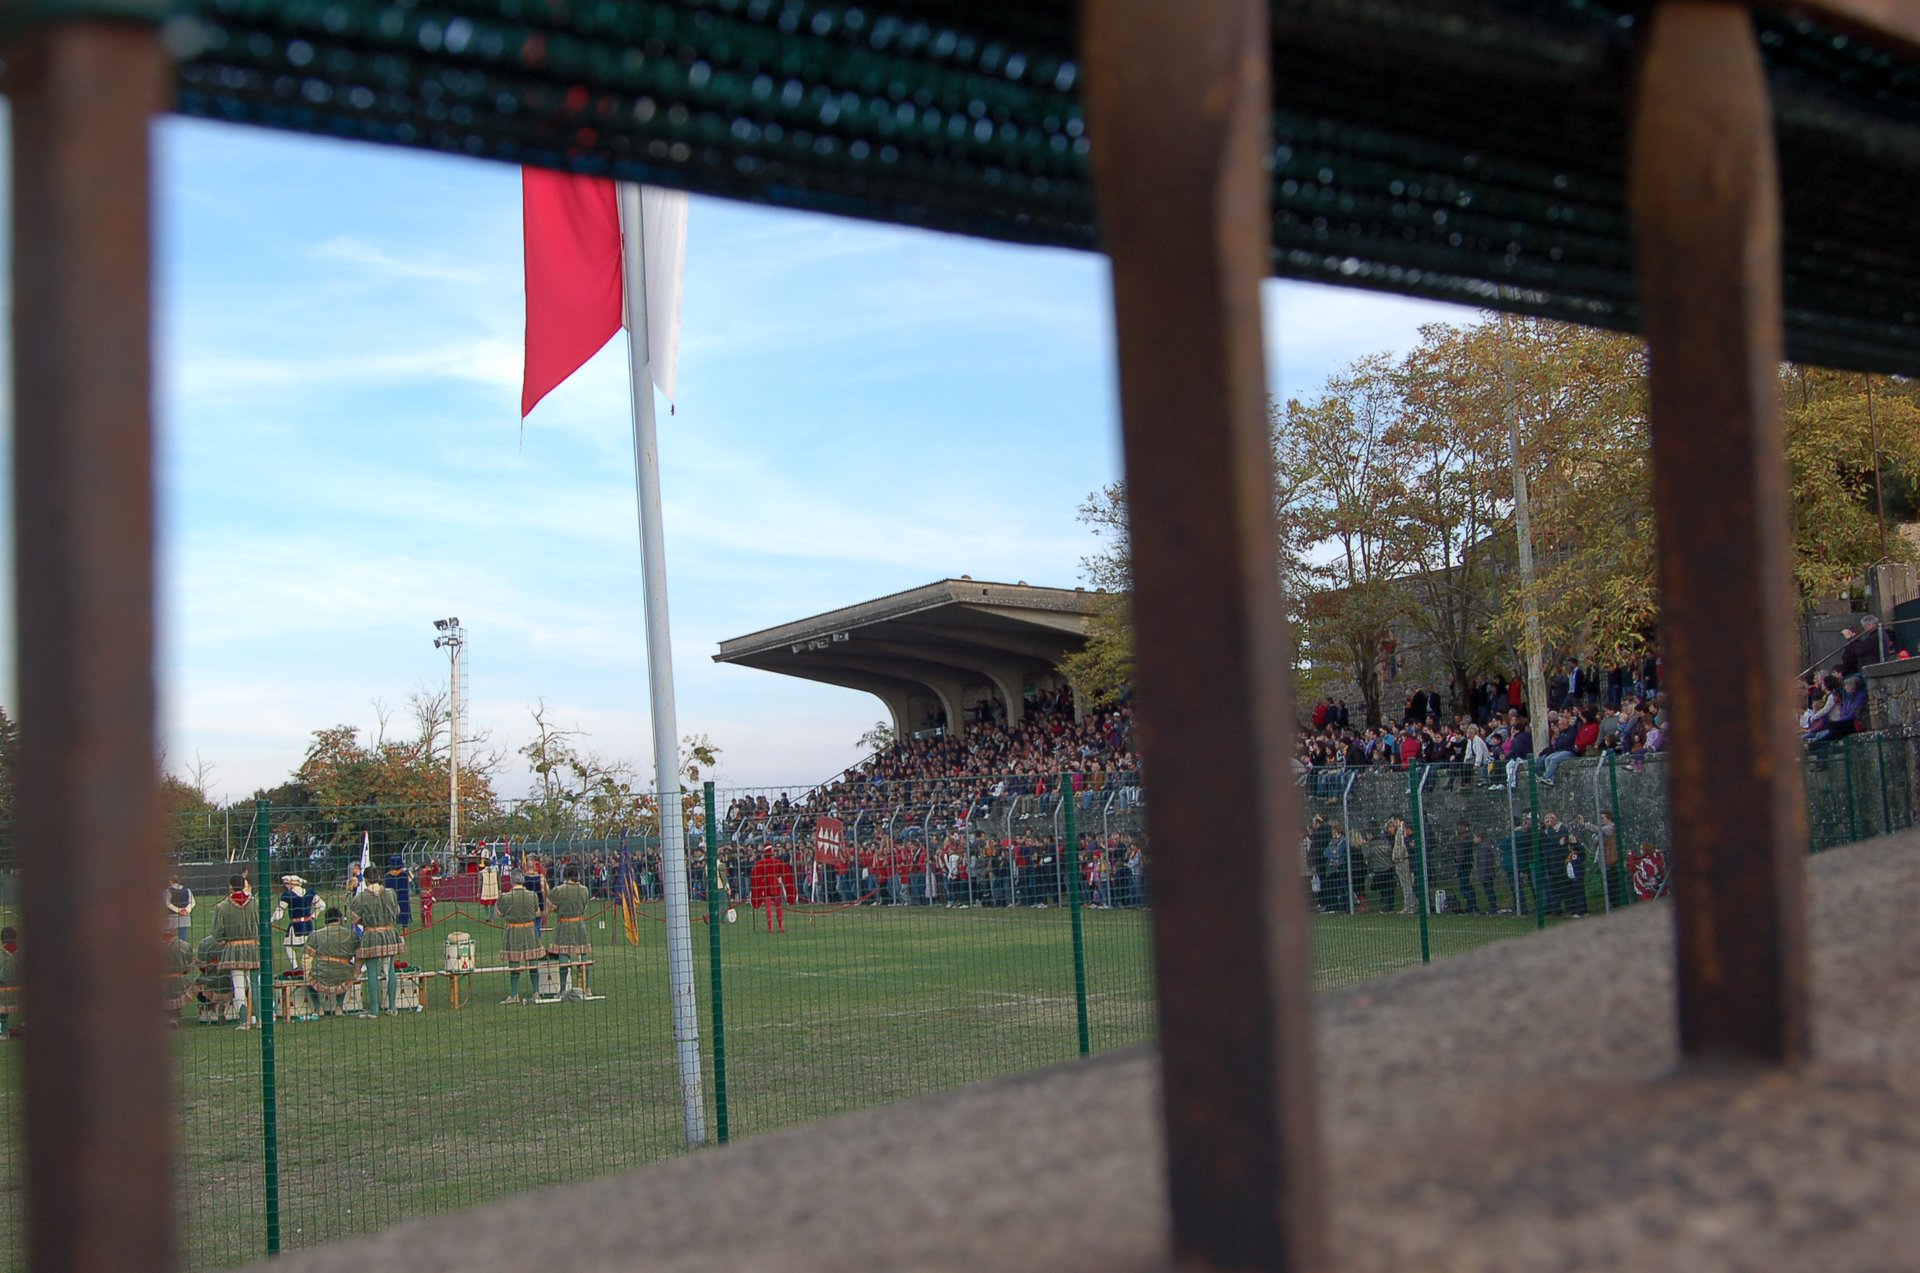 Archery competition at the Sagra del tordo in Montalcino 2020